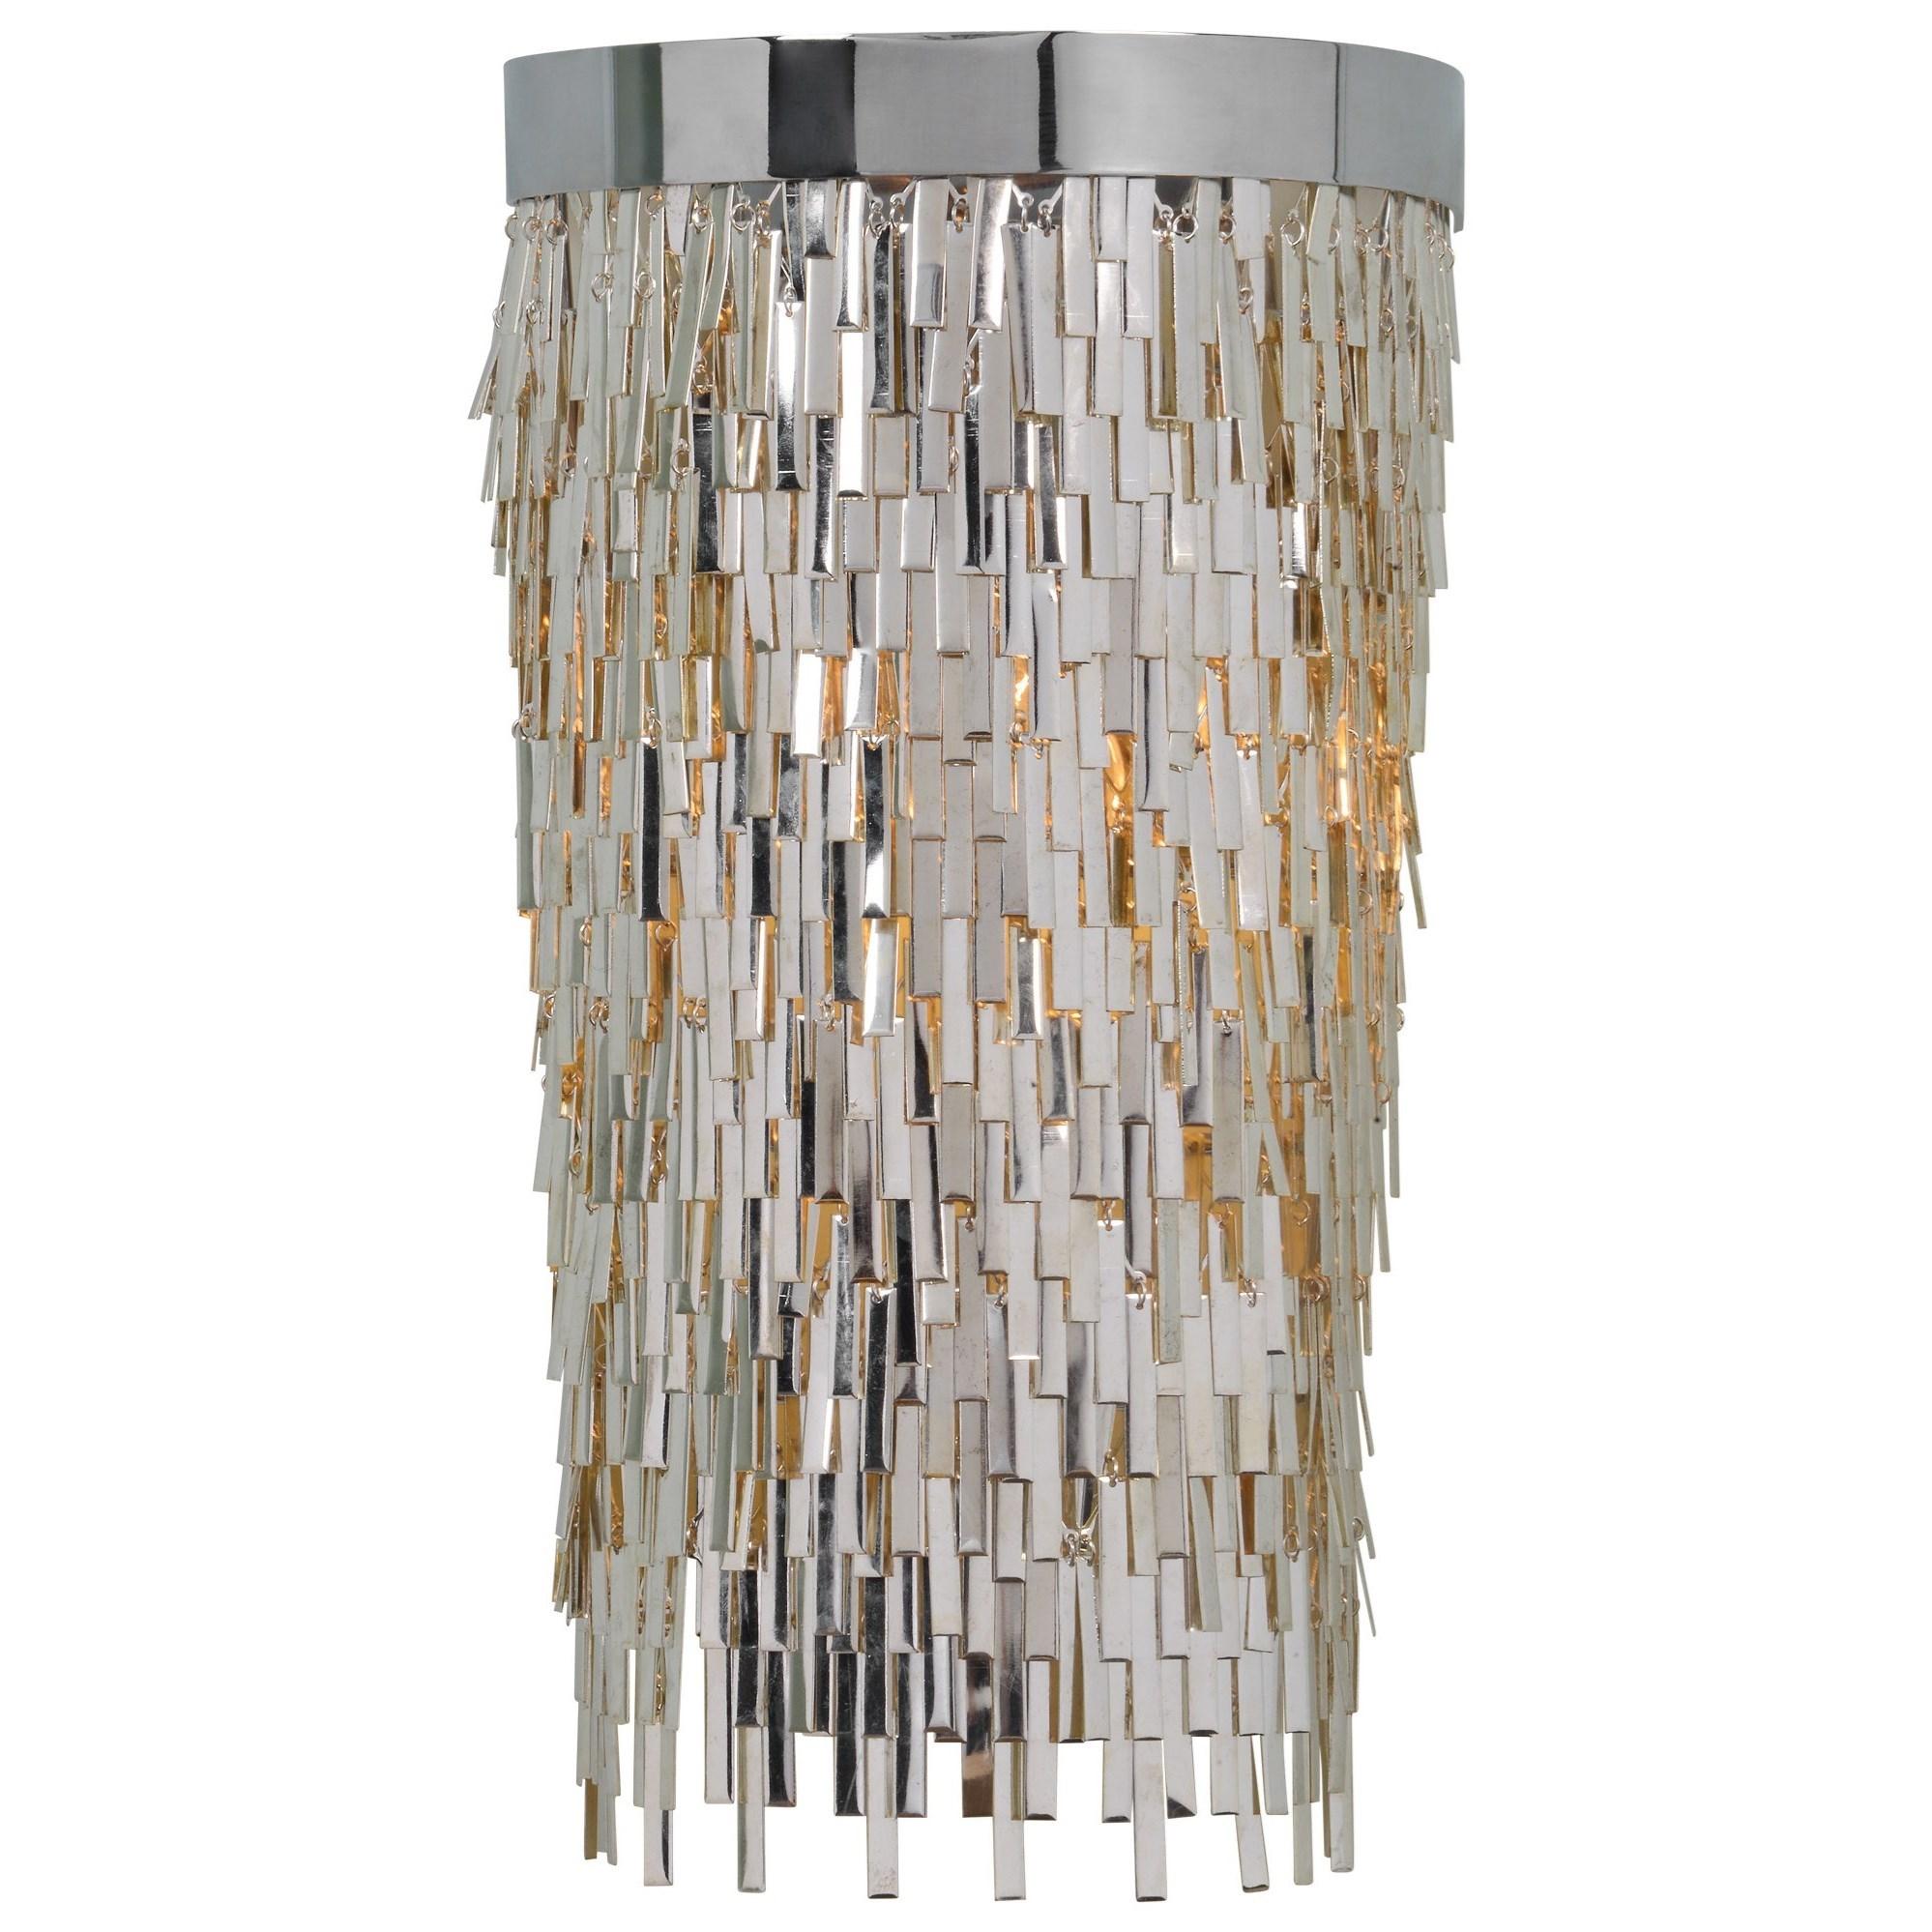 Uttermost Lighting Fixtures Millie 1 Light Chrome Sconce - Item Number: 22506